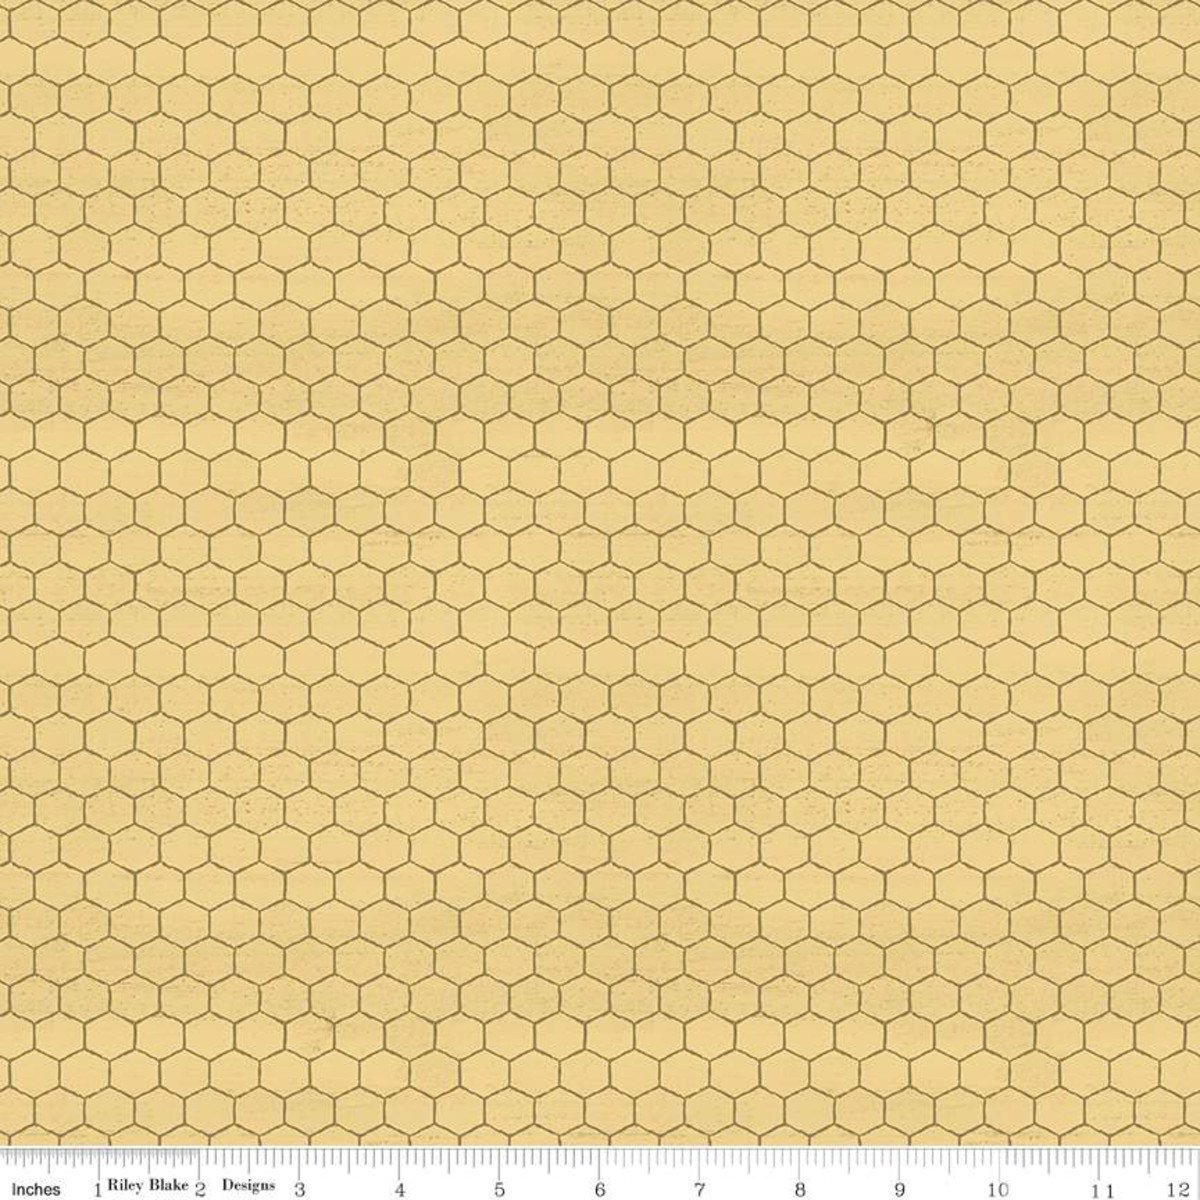 Bees Life C10104 Honeycomb Honey